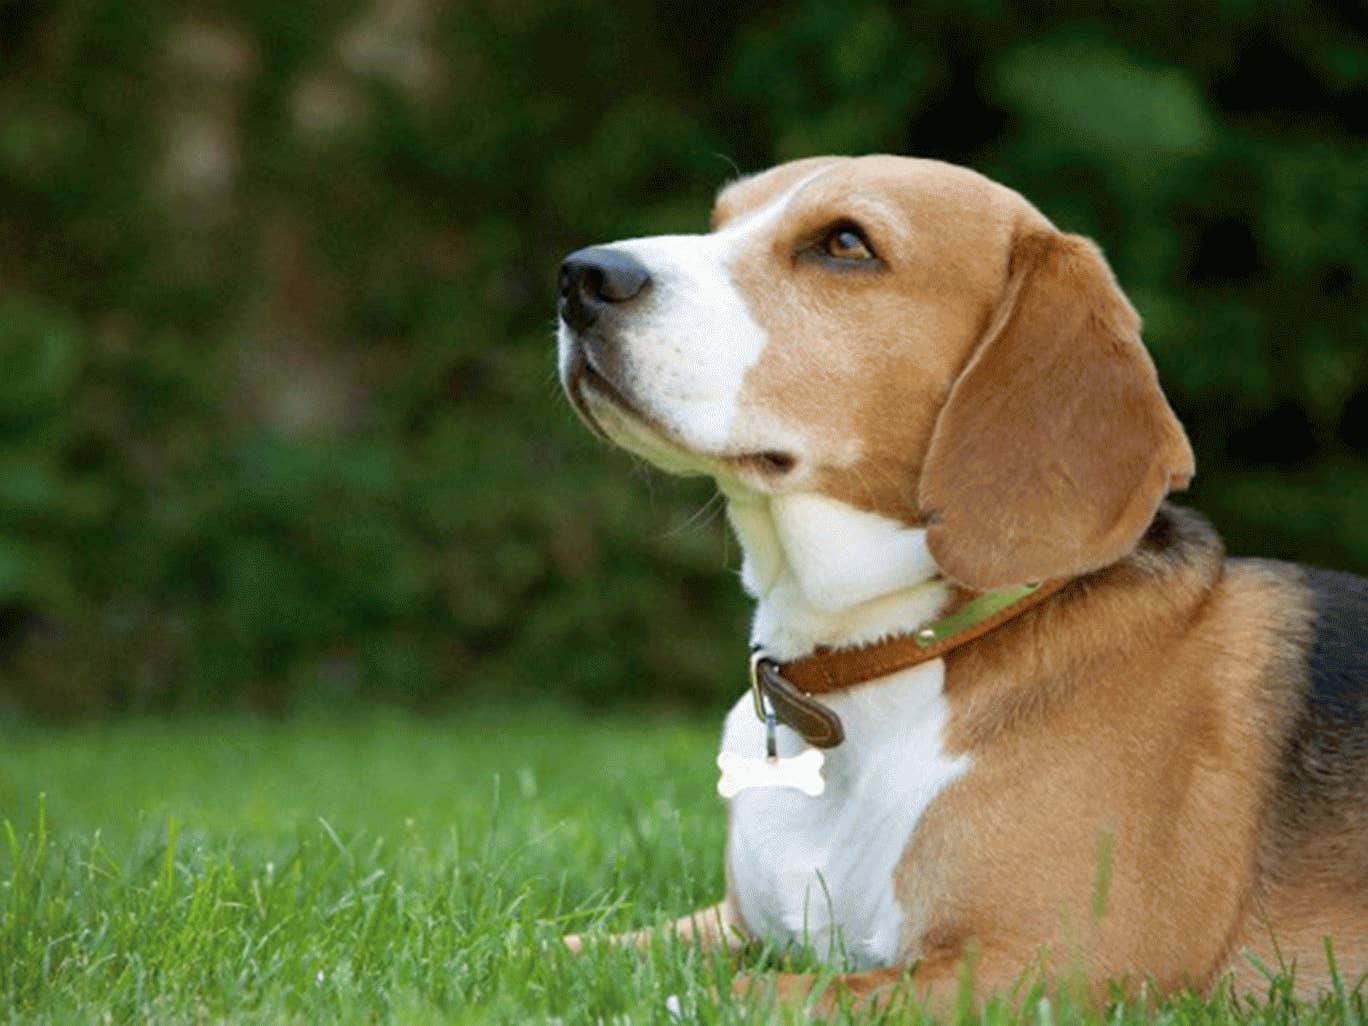 Animal rights dating uk-in-Kavchia